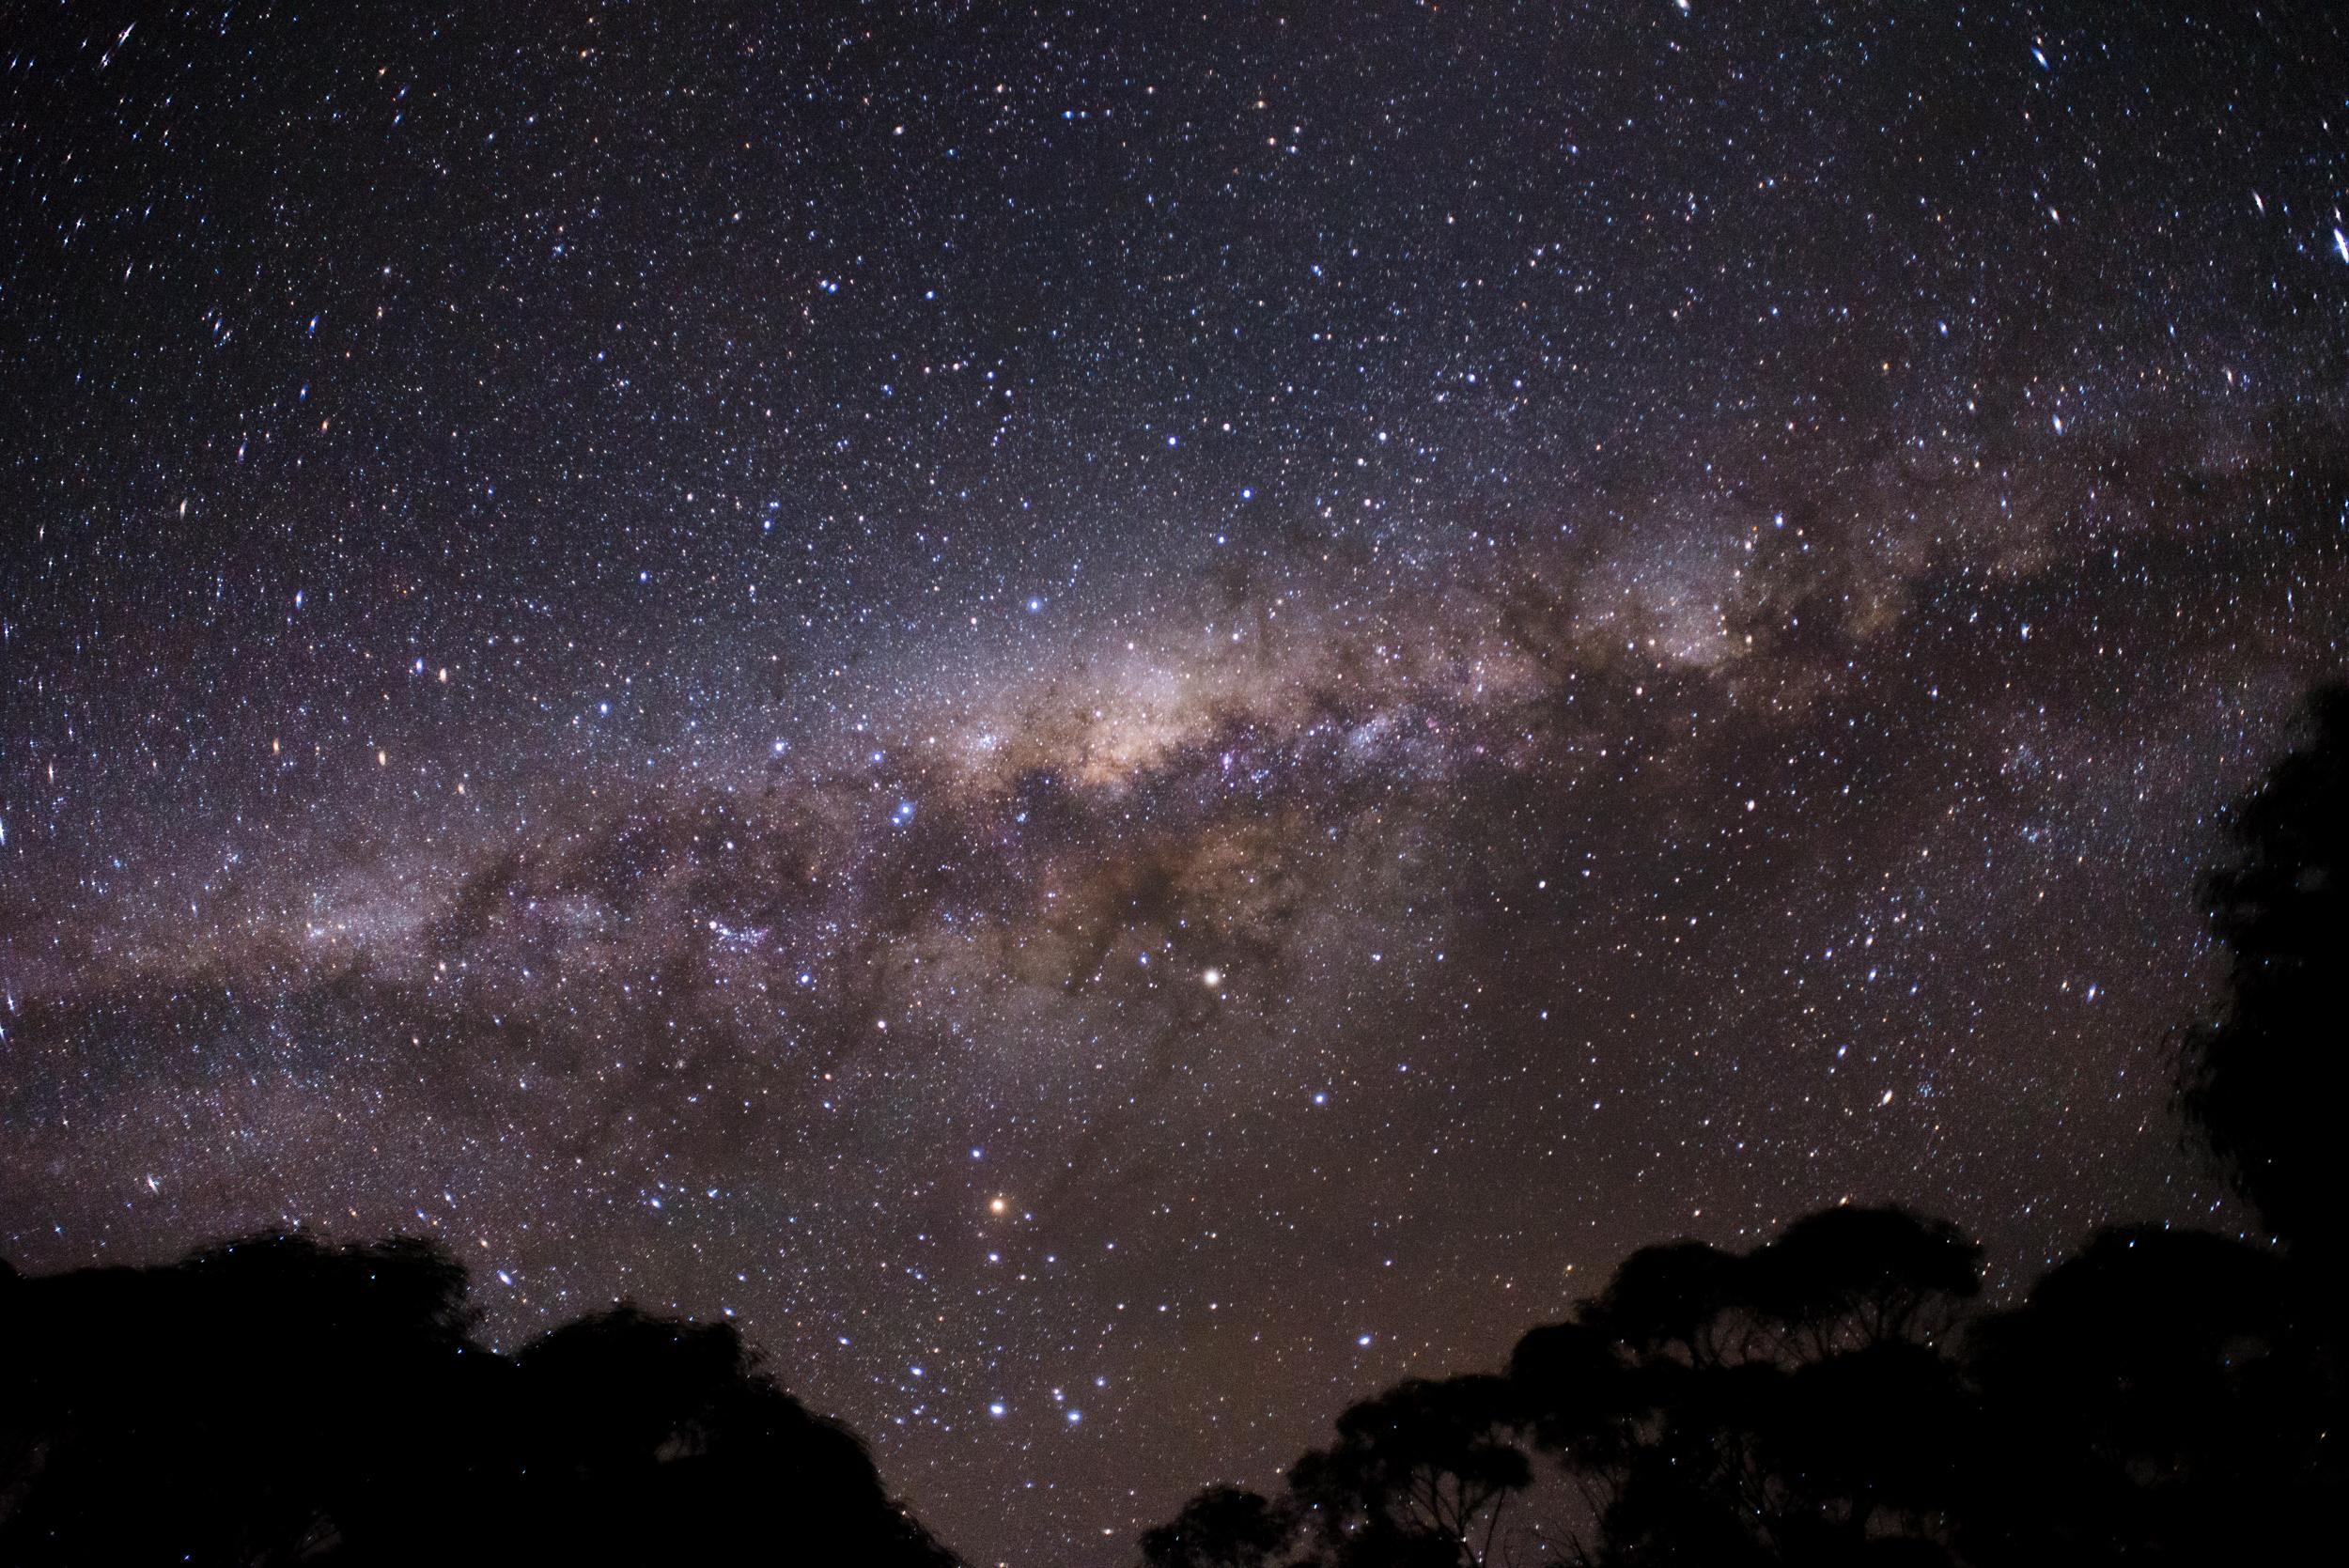 kanangra boyd national park astrophotography milky way